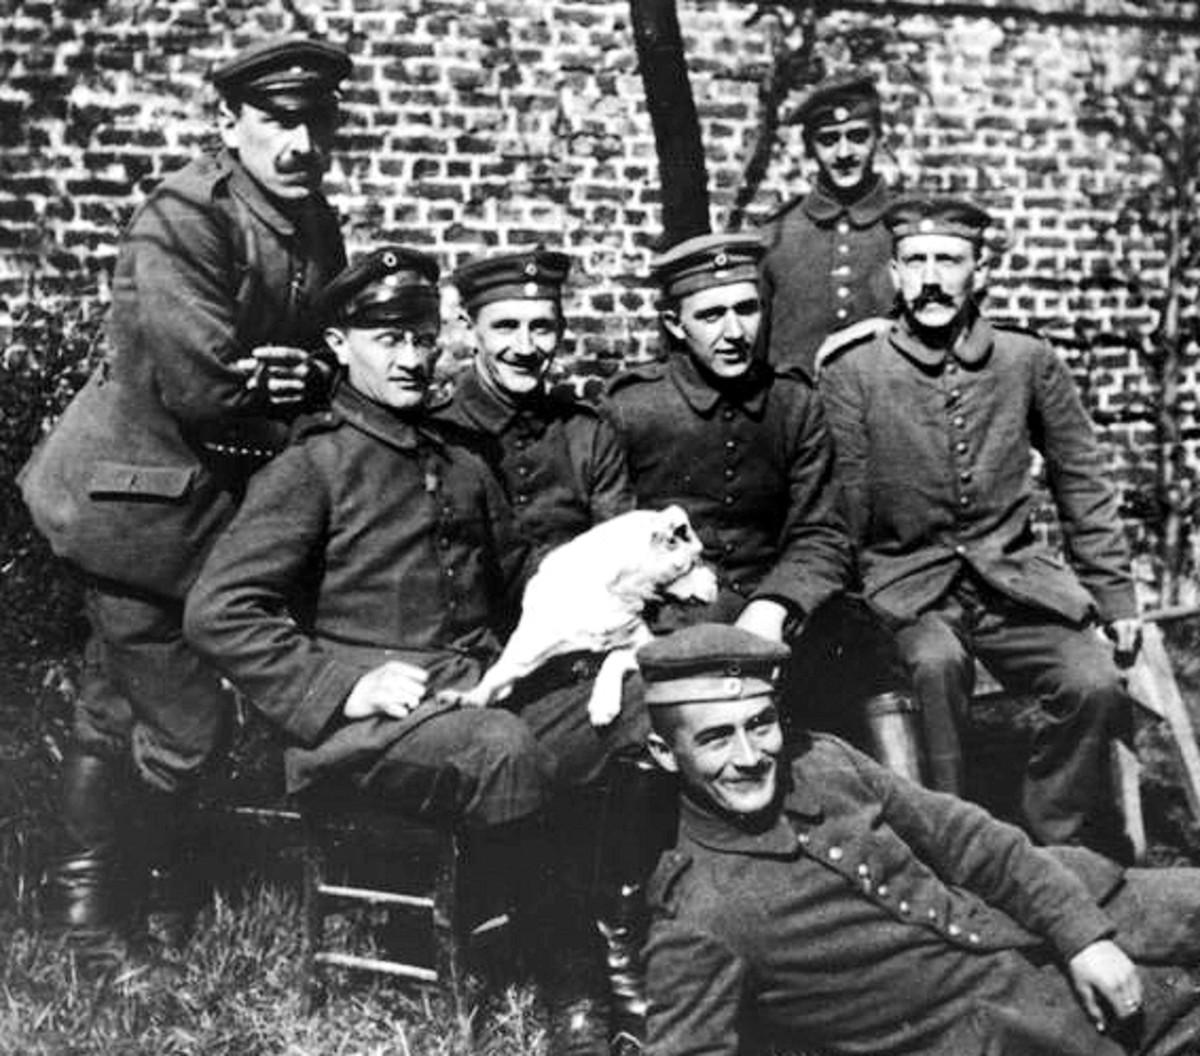 Hitler (Far Right) during the First World War.